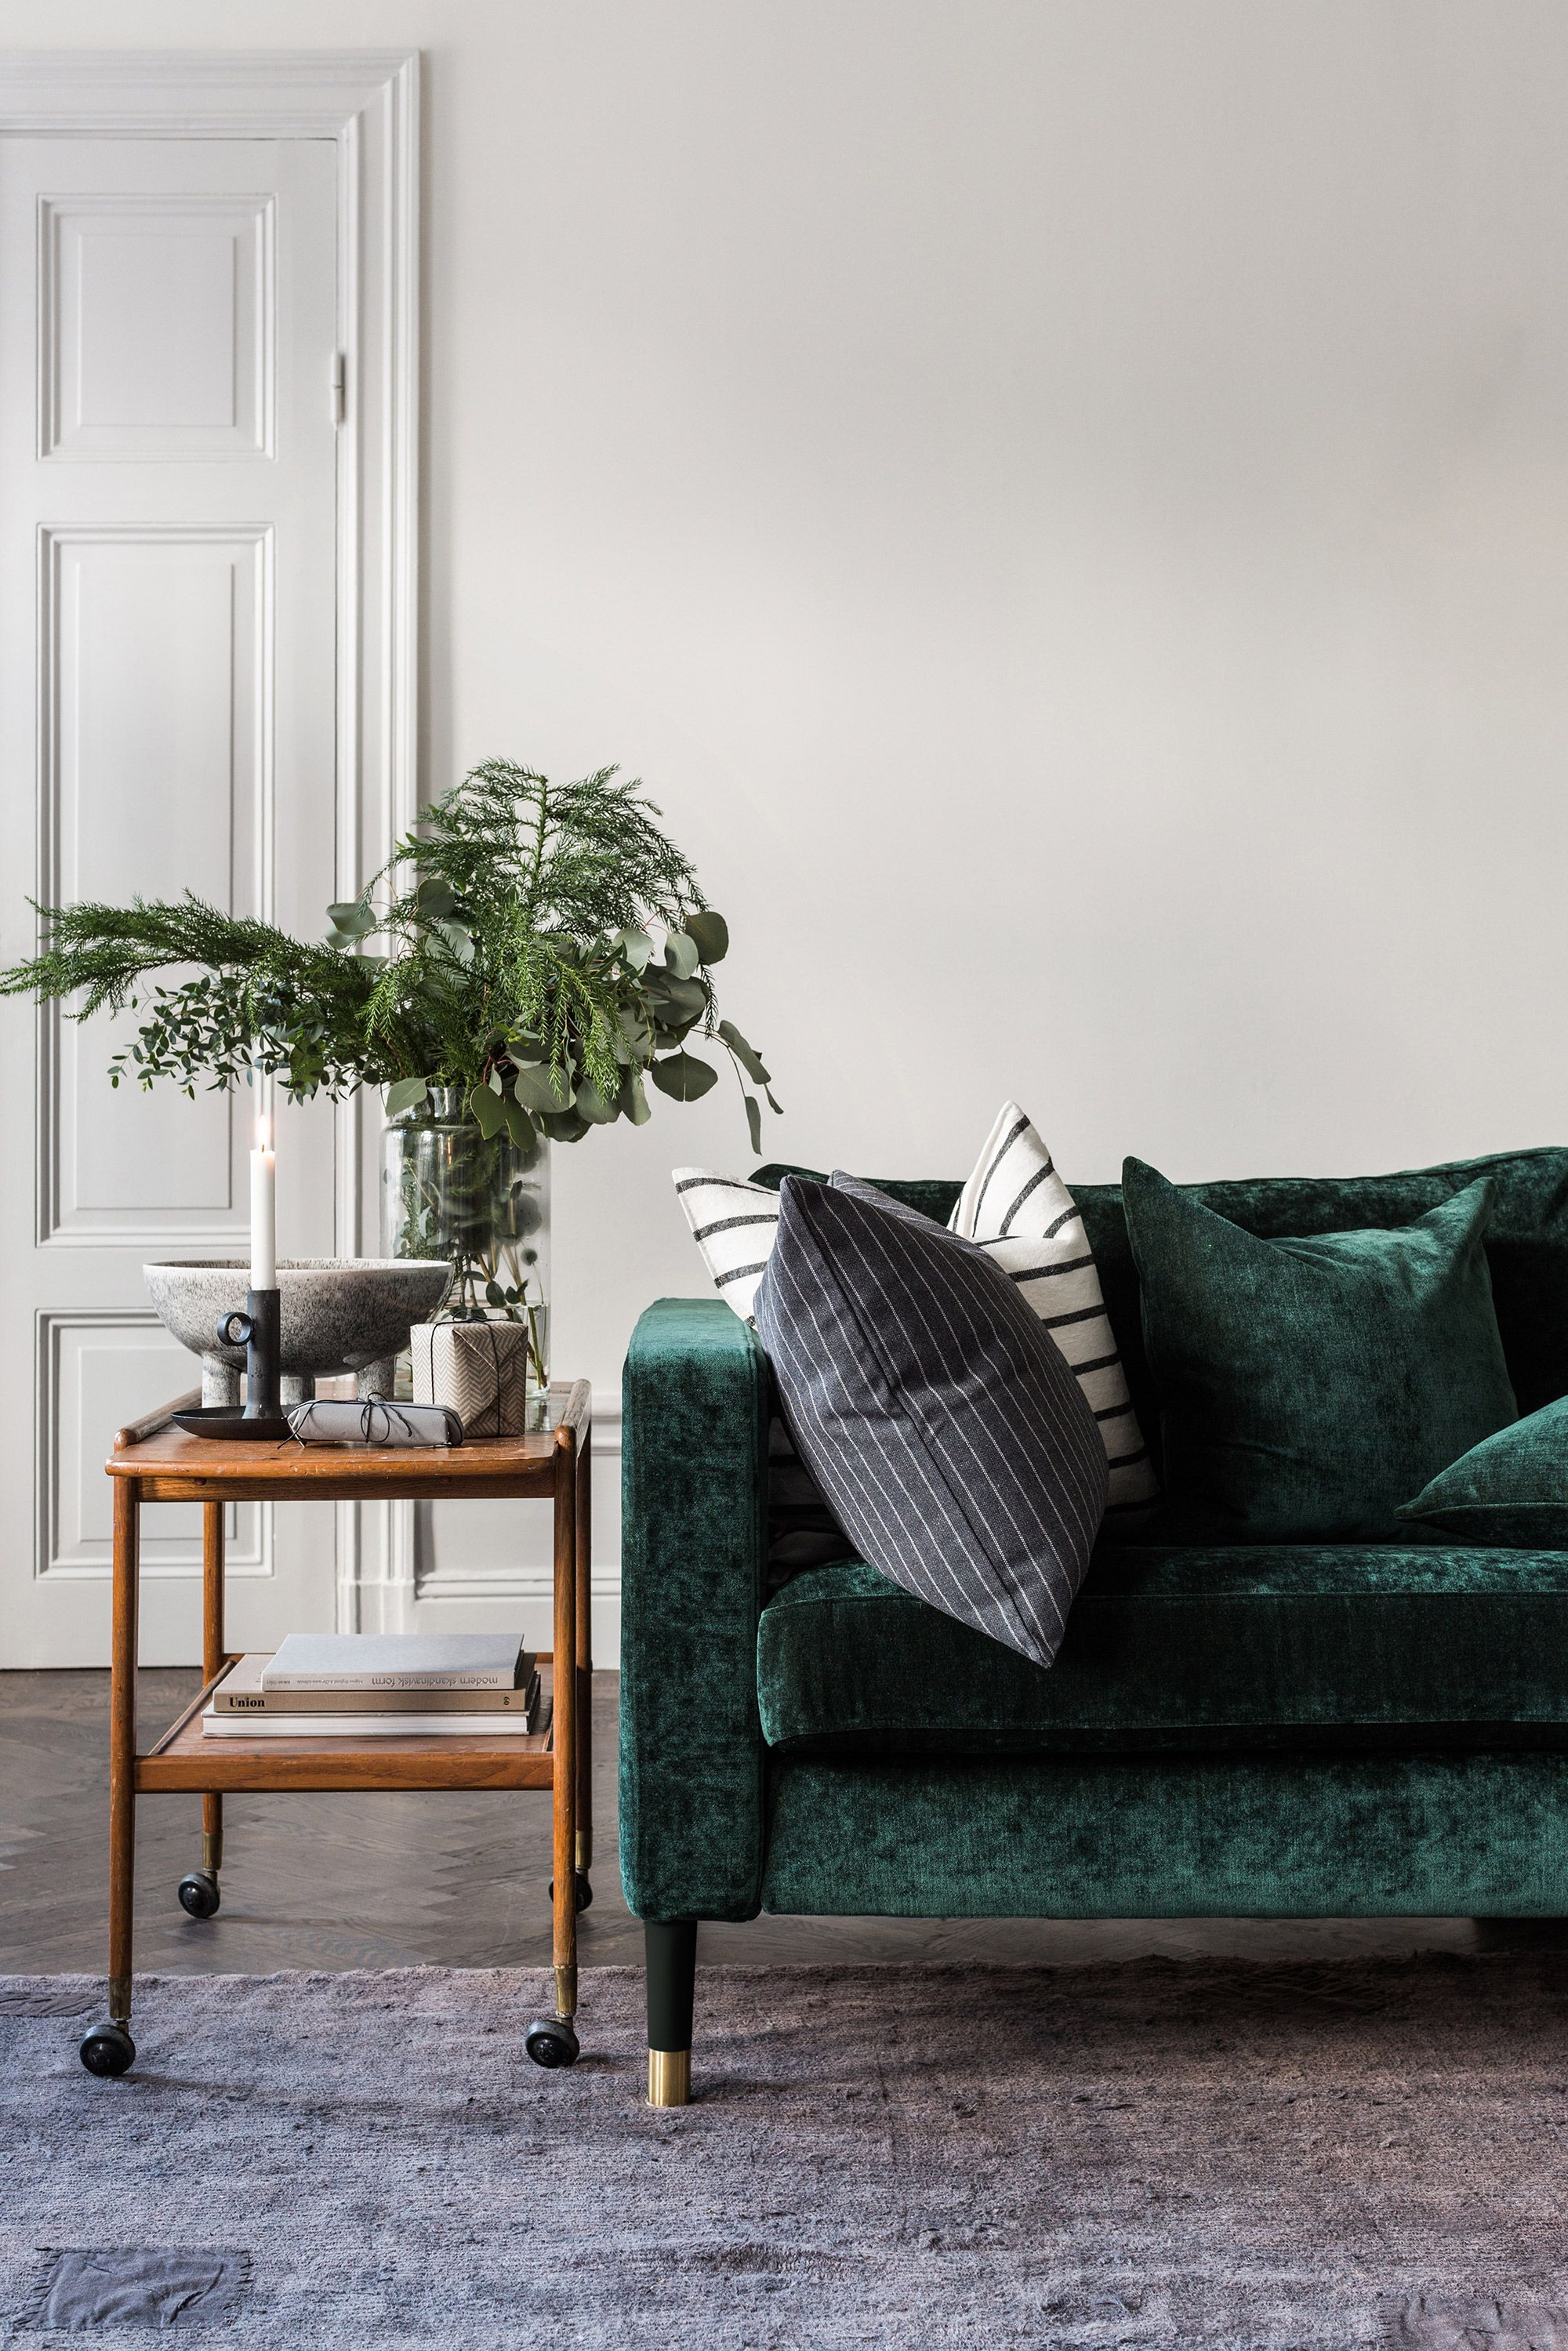 luxe green velvet sofa | retro bar cart sideboard | fir tree and eucalyptus bouquet | IKEA Karlstad sofa with a Bemz cover in Viridian velvet by Designers Guild | Bemz cushion covers | panelled wooden door | herringbone floors